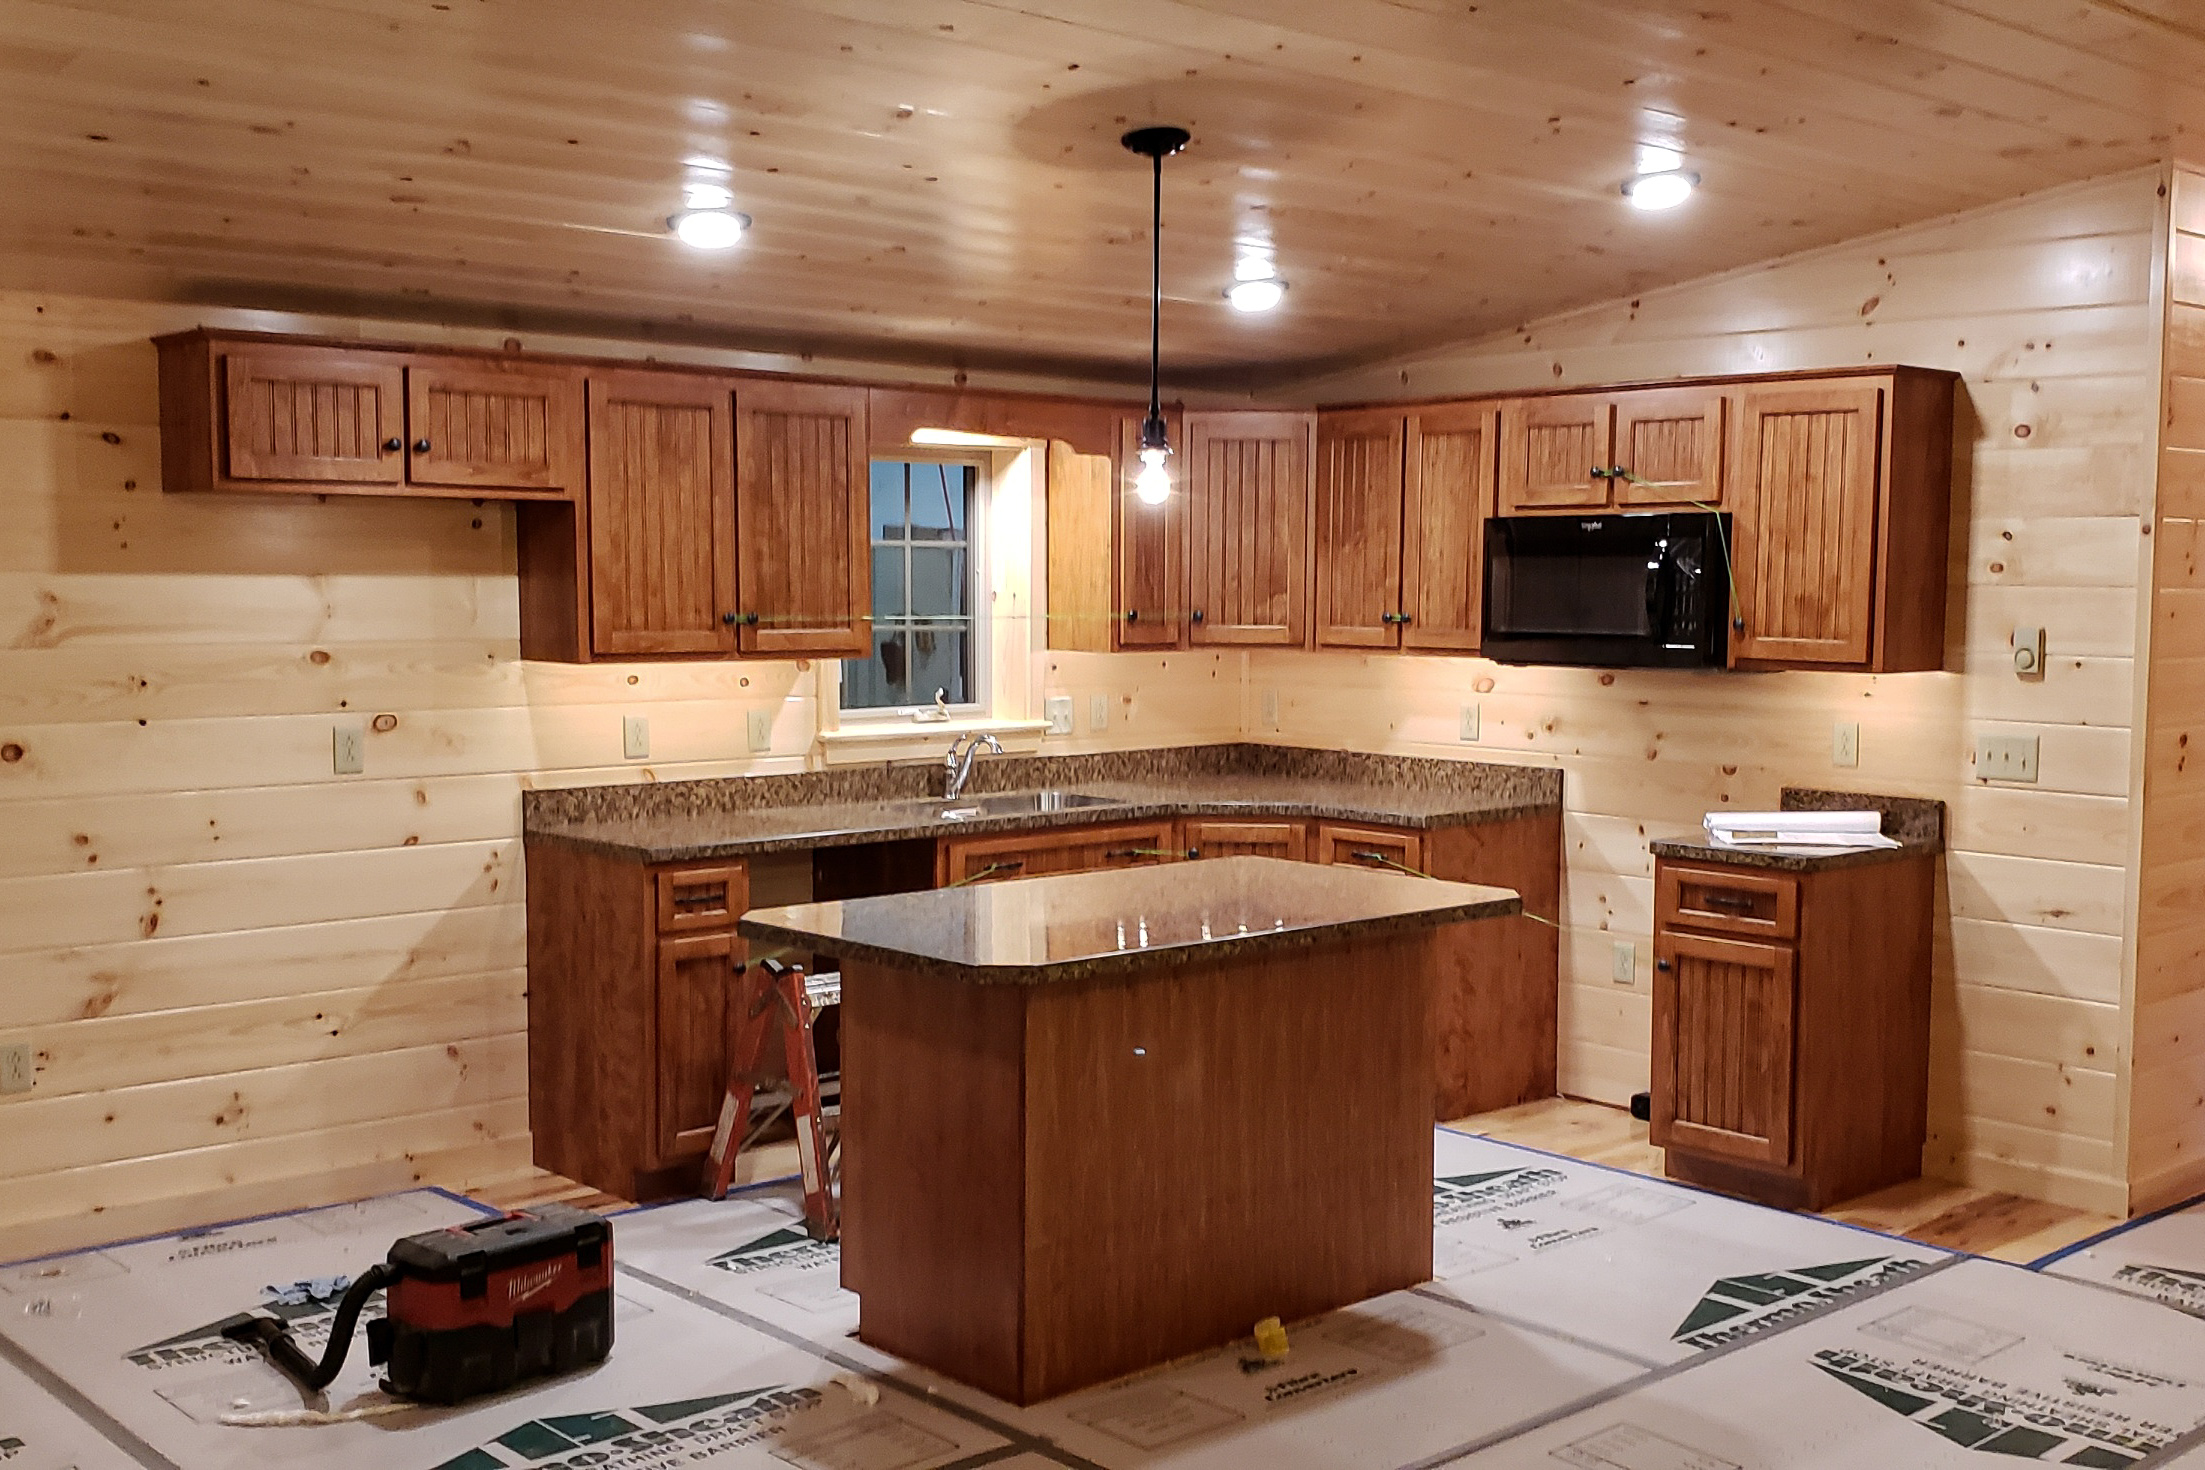 kitchen layout in cabin in jerfferson new hamshire